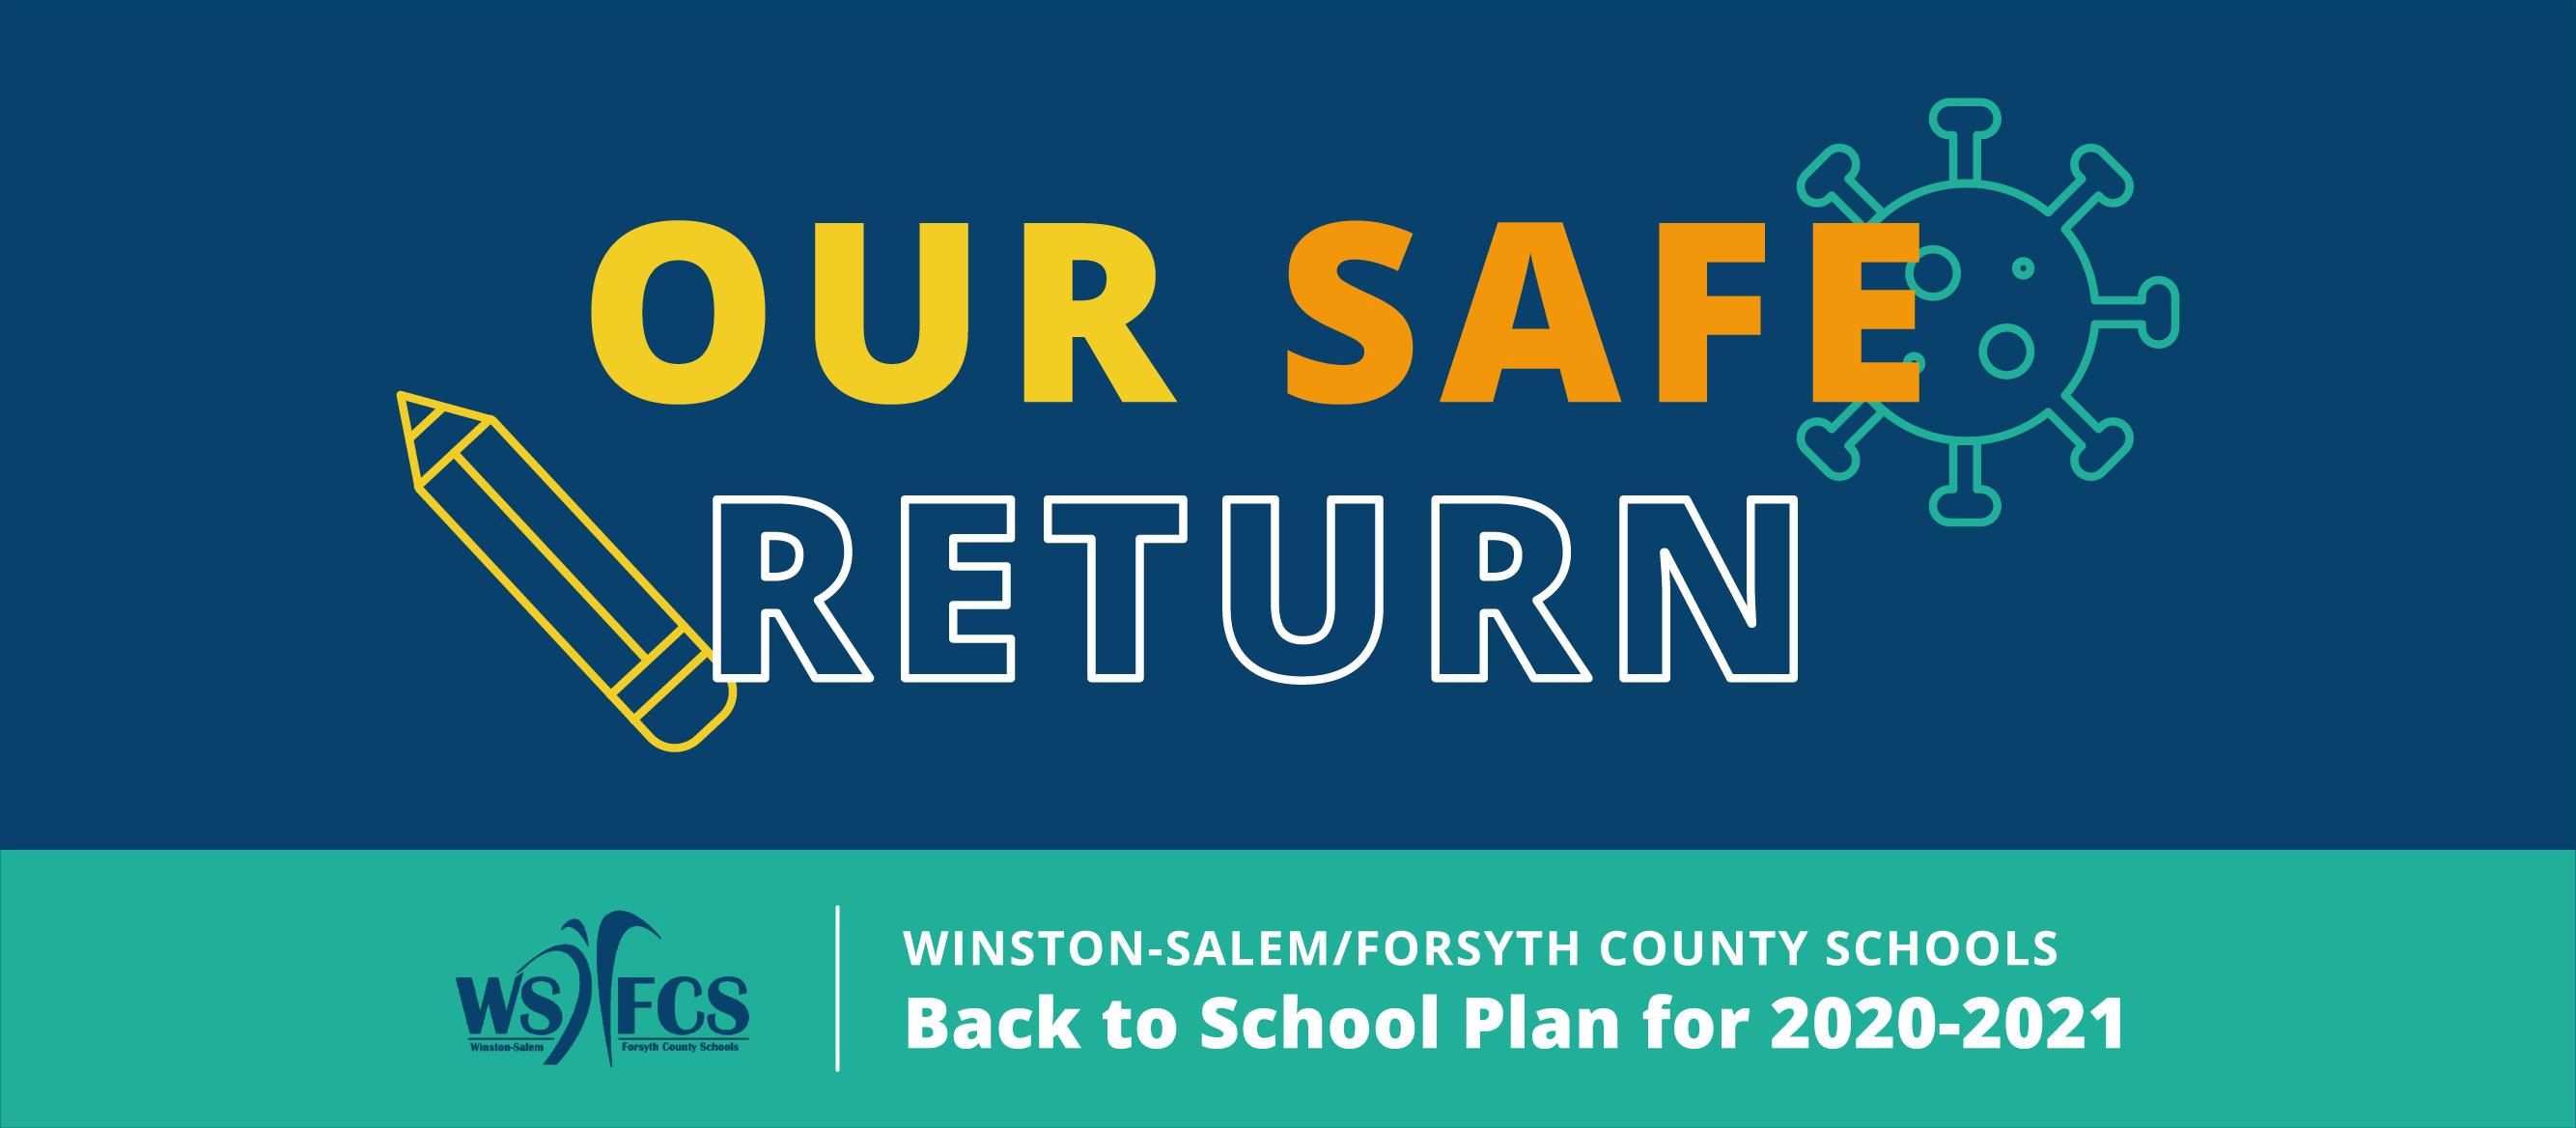 Winston Salem Forsyth County School Calendar 2021-2022 Images